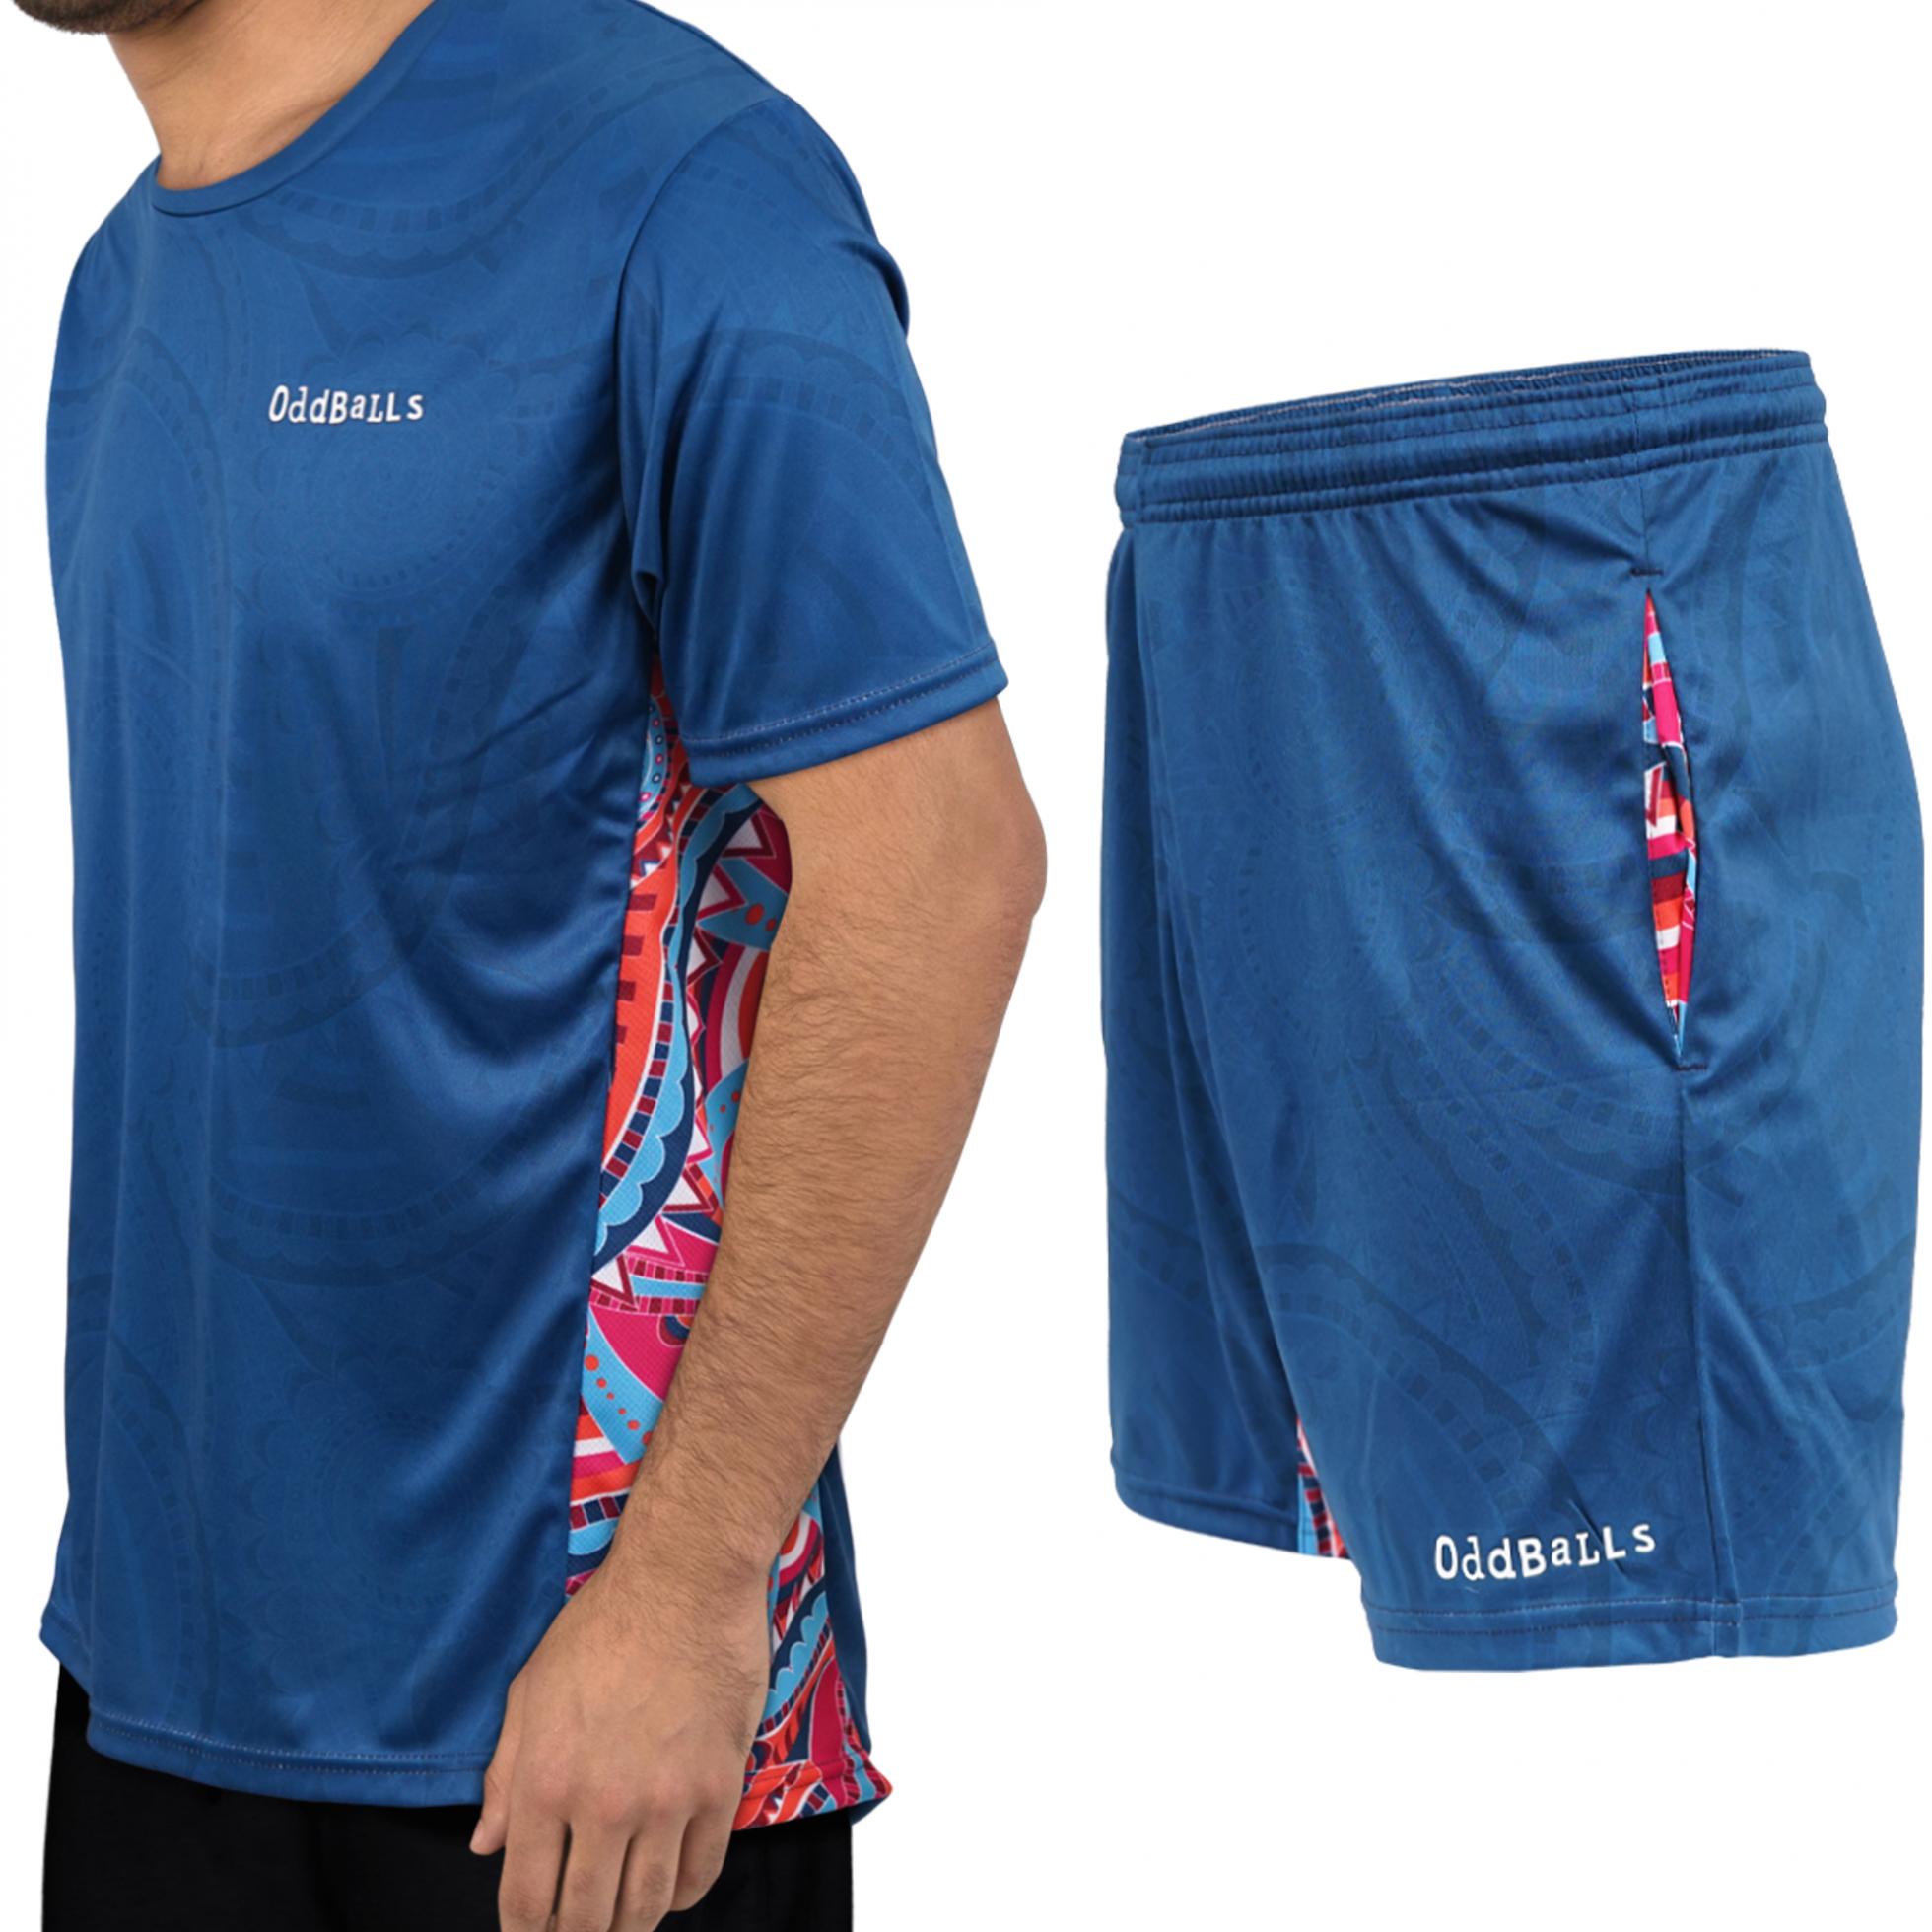 Fiesta - T-Shirt & Sports Shorts Bundle - XS